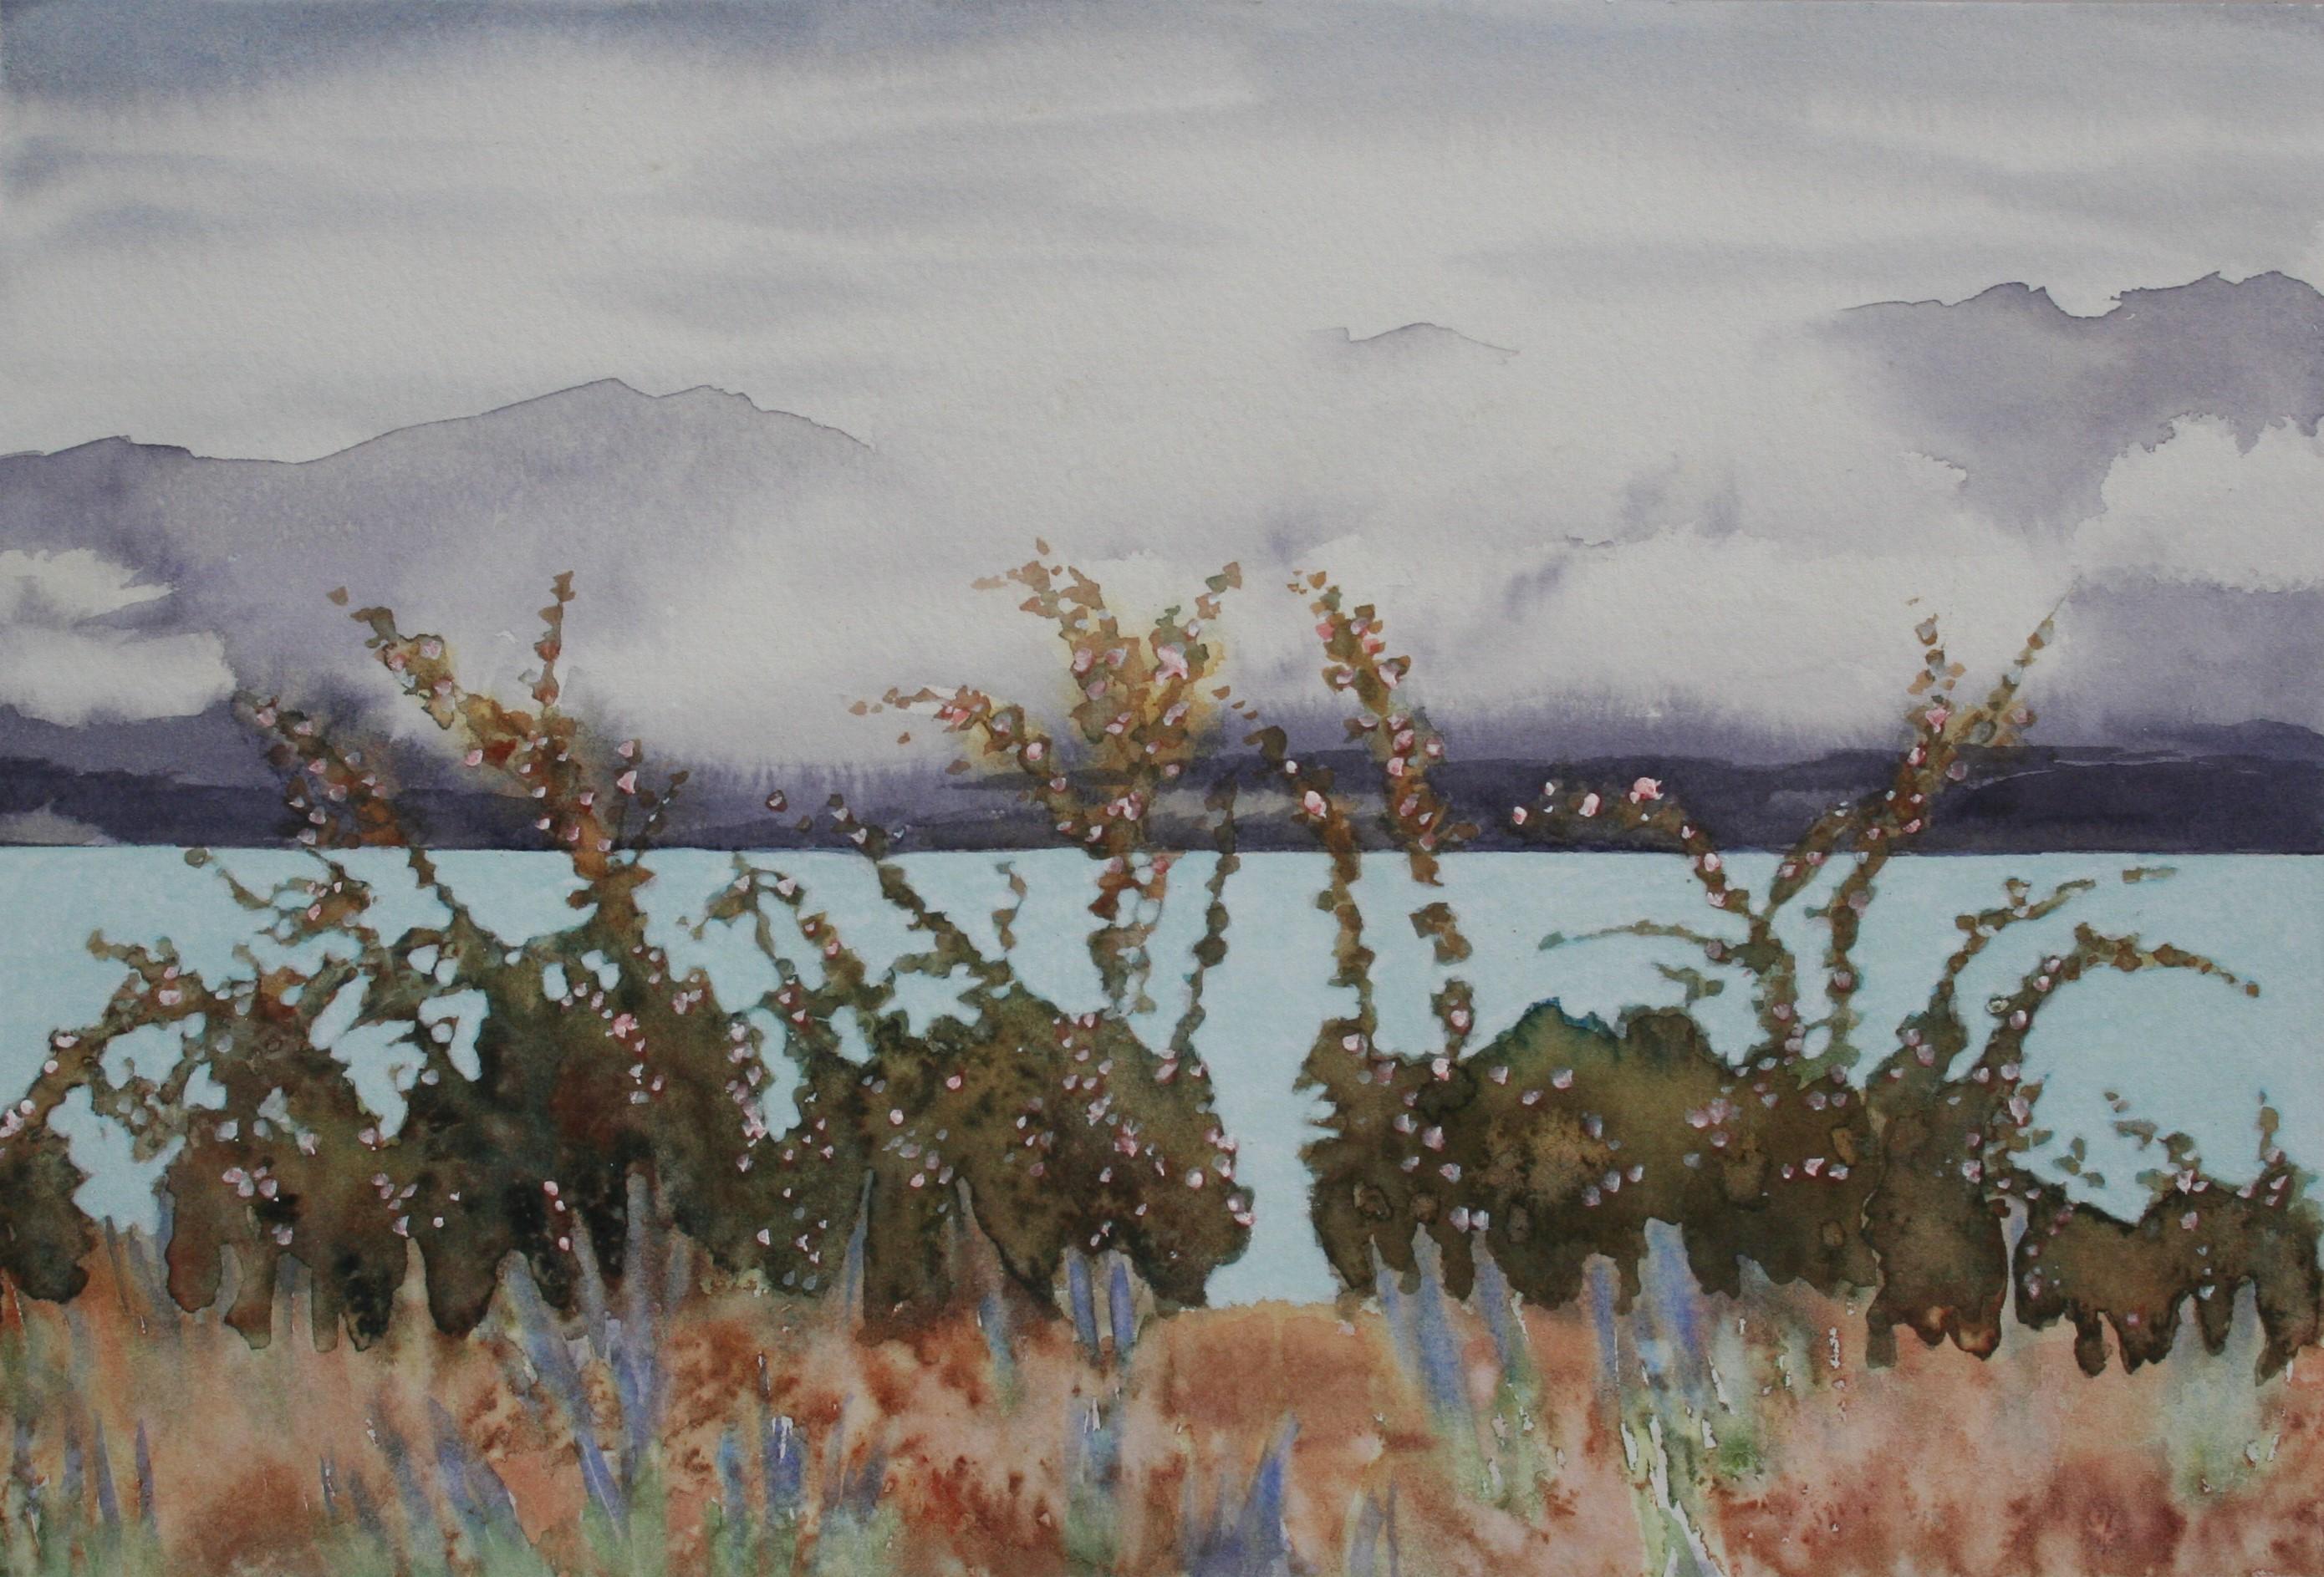 Turquoise Lake 2, New Zealand Series